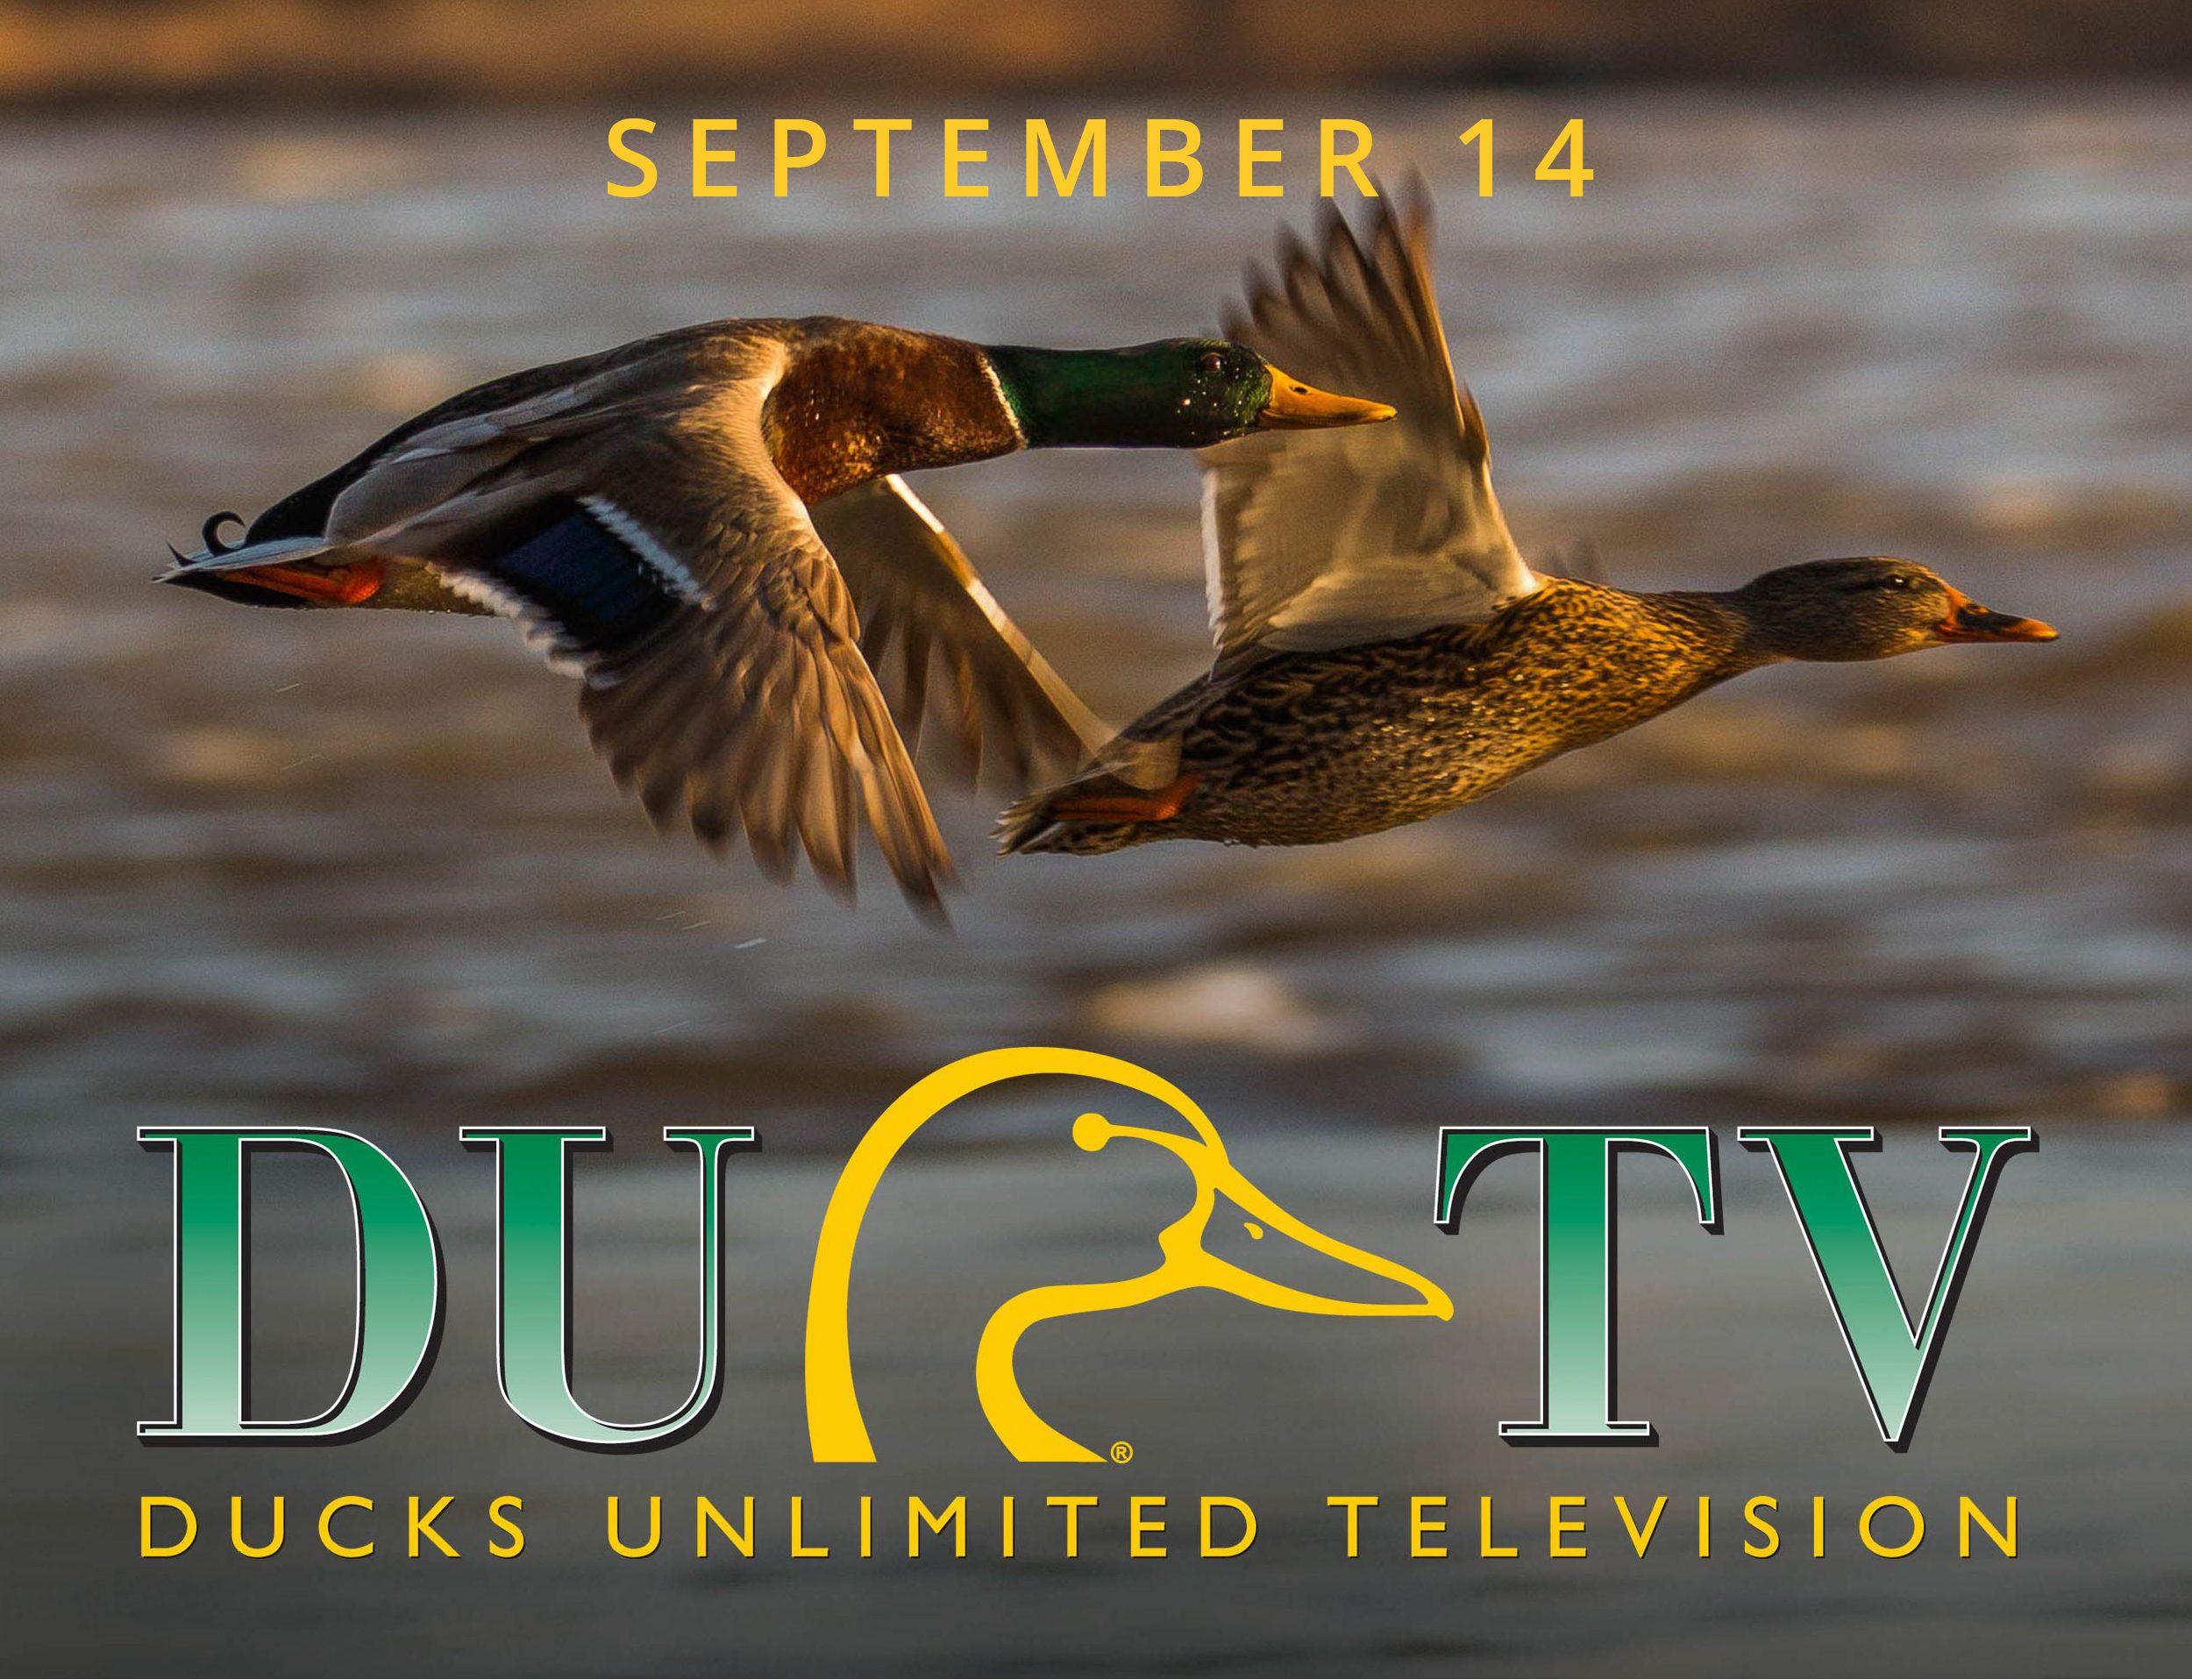 Ducks Unlimited TV